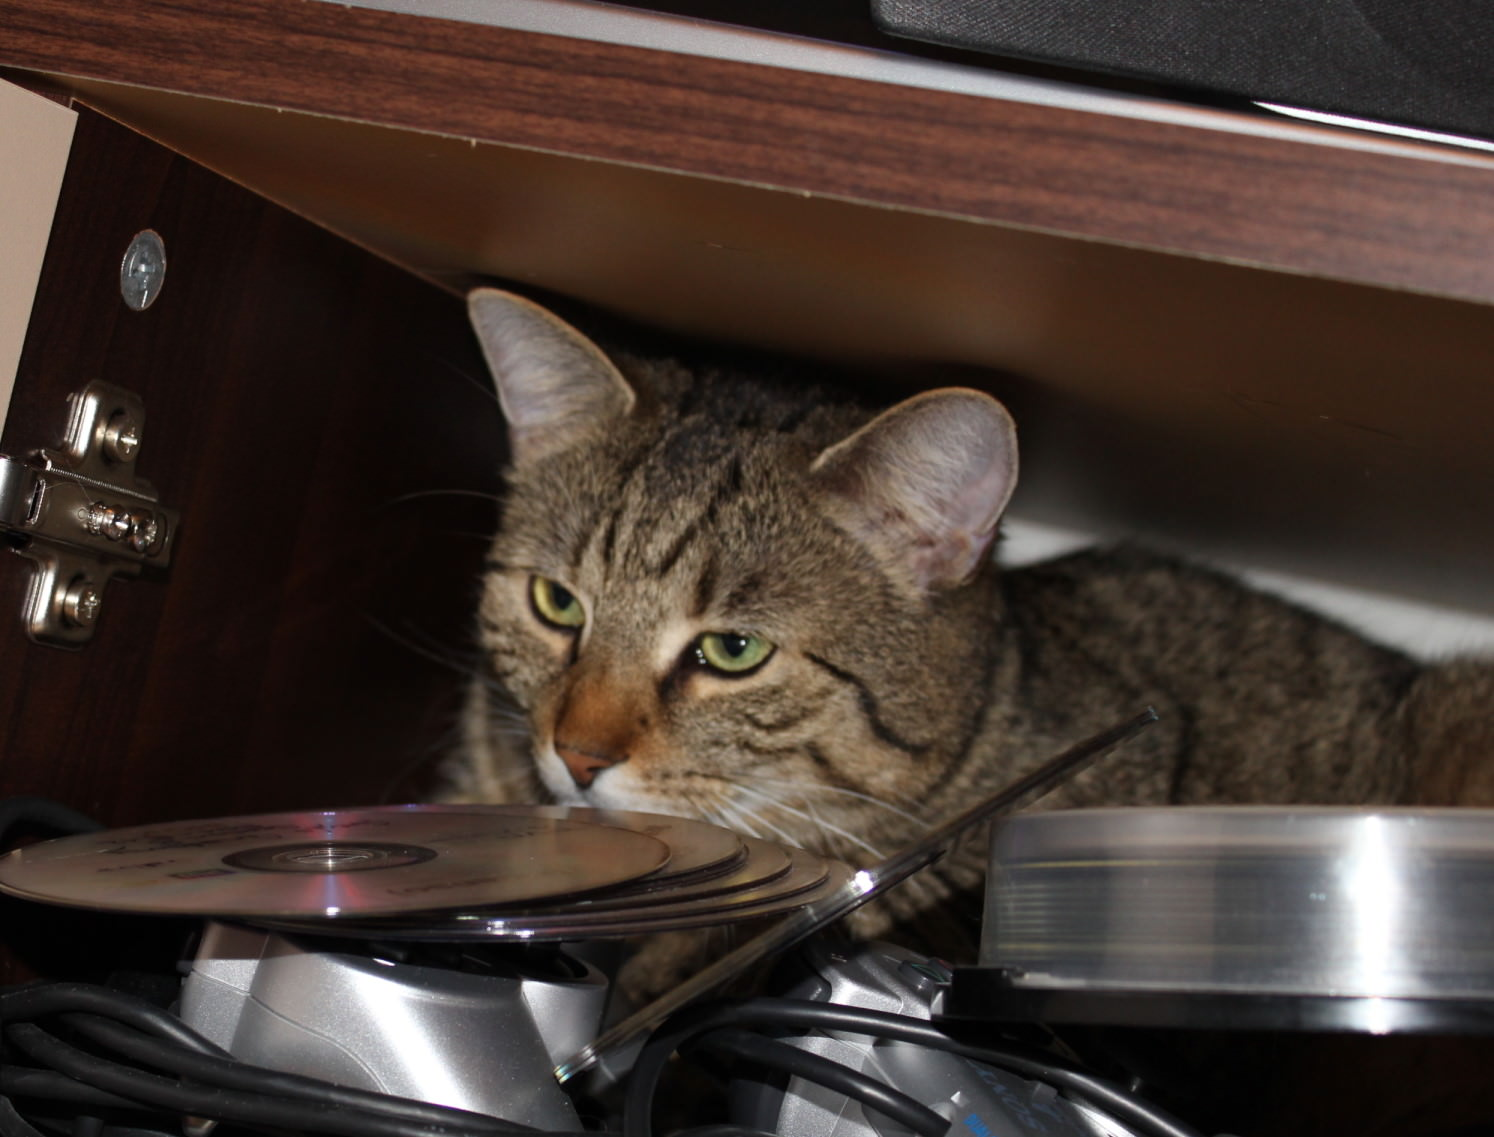 Jasper: Wo die Katzenrübe reinpasst…